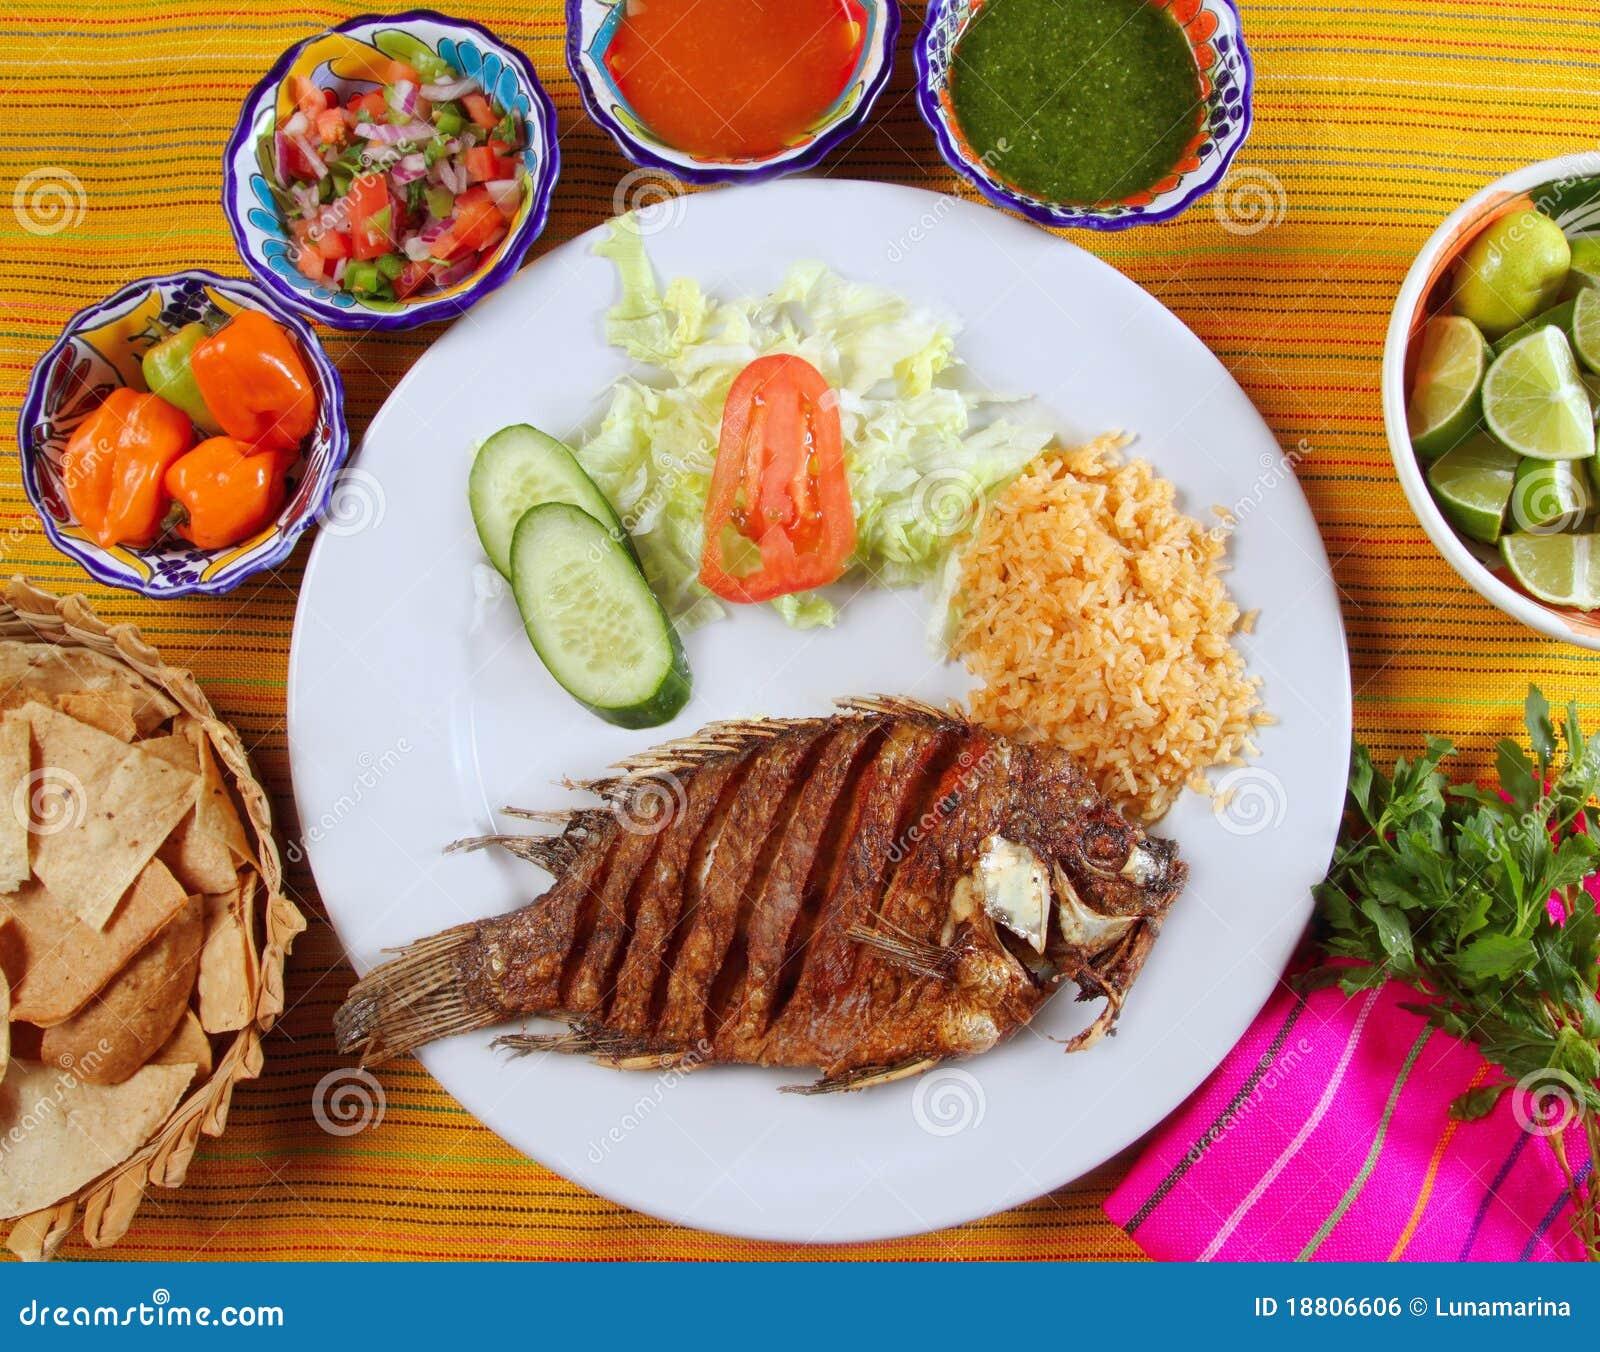 Fried Mojarra Tilapia Fish Mexico Style Royalty Free Stock Image ...